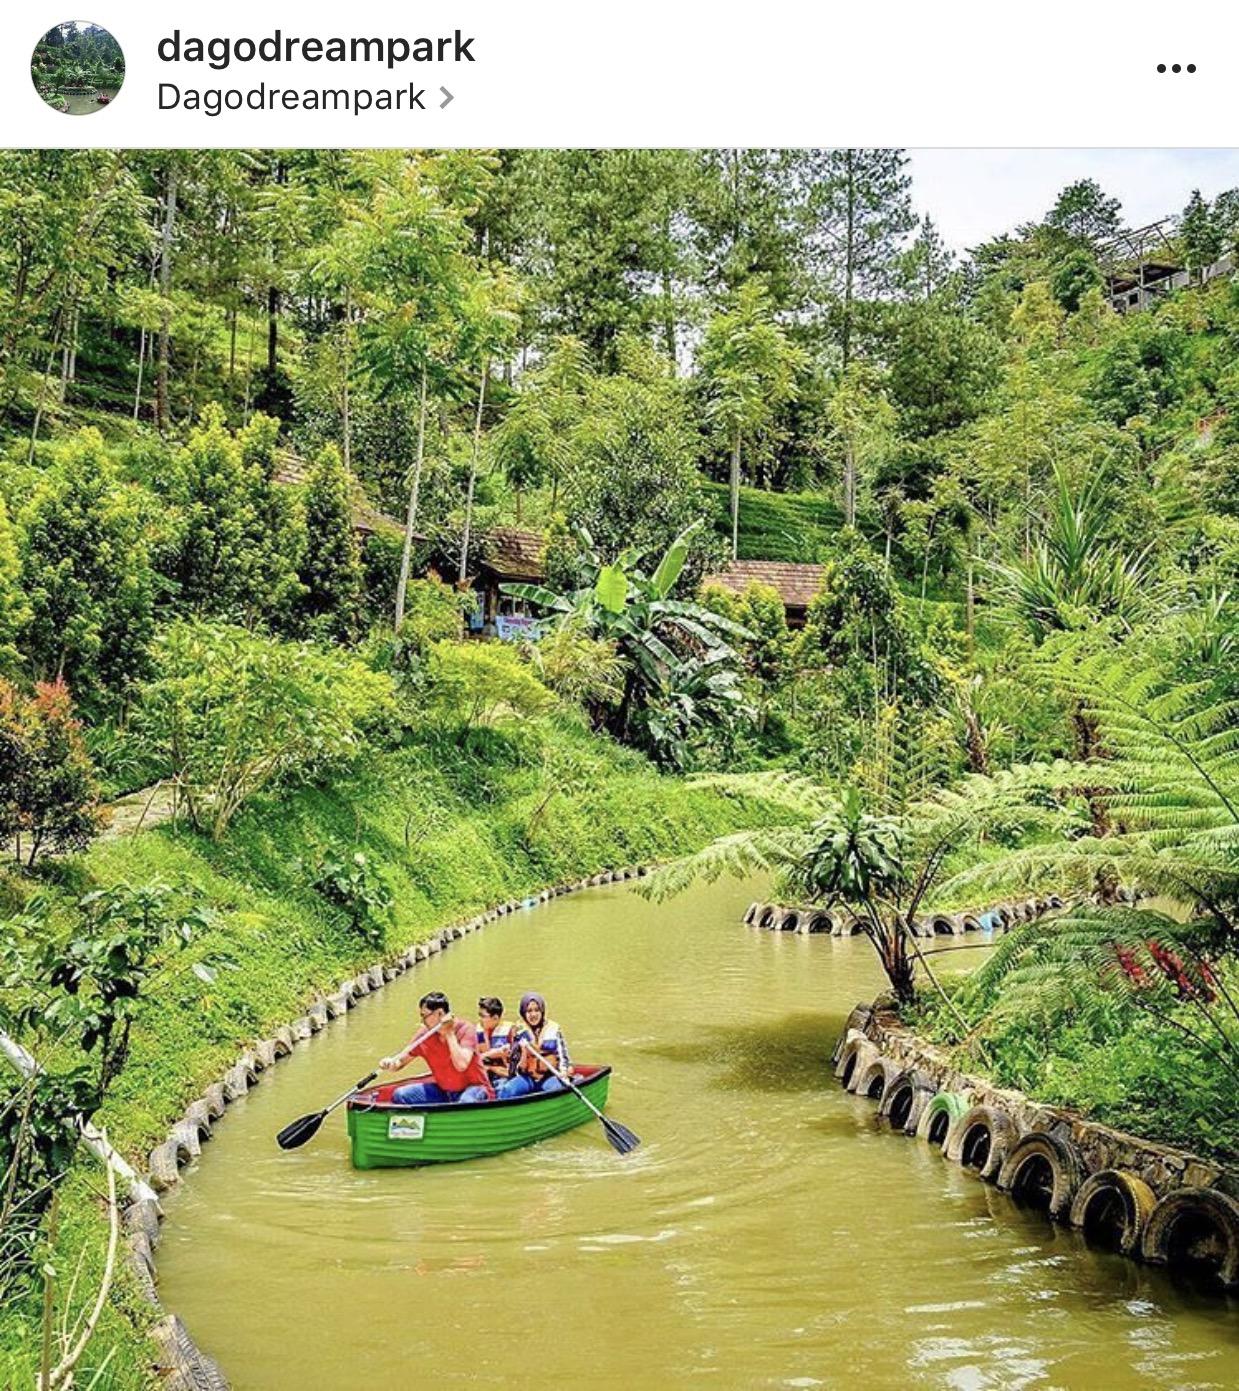 Dago Dream Park - Kids Holiday Spots - Liburan Anak - Informasi